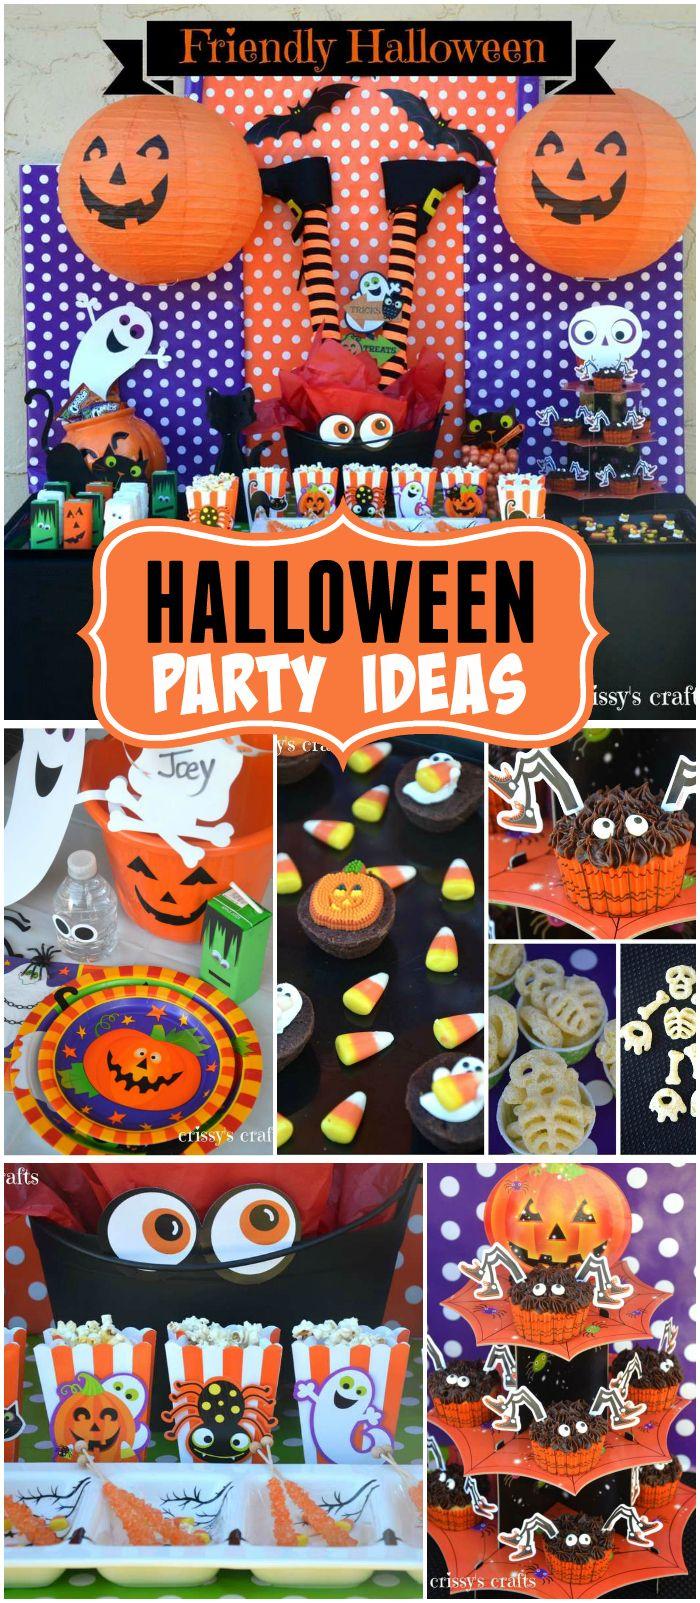 17 best ideas about kids halloween parties on pinterest kid halloween halloween party for. Black Bedroom Furniture Sets. Home Design Ideas